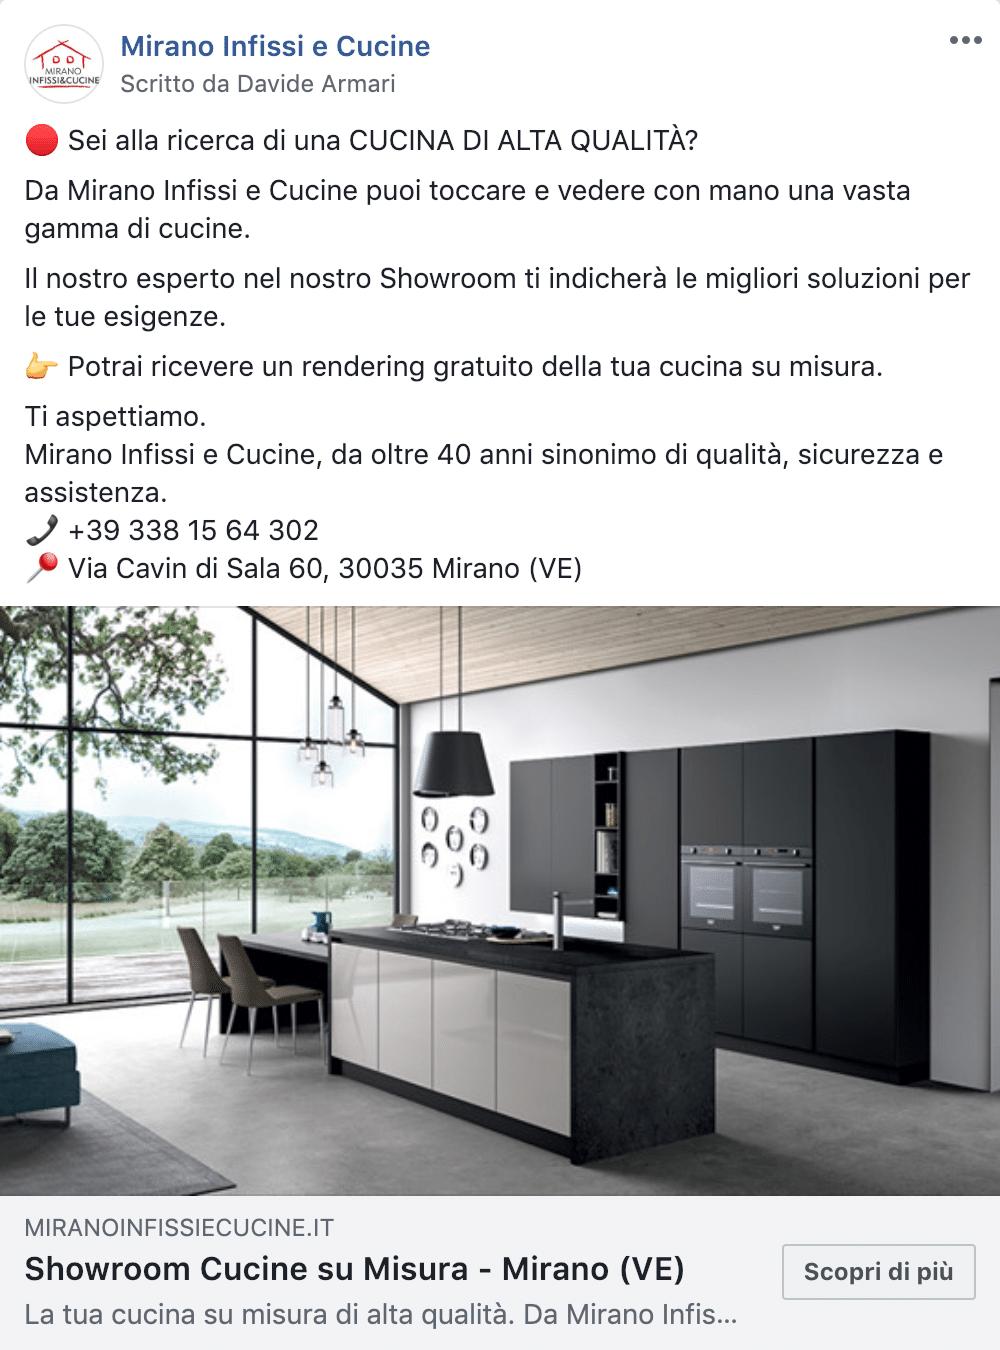 Esempio Showroom CucinePagina Facebook: Mirano Infissi e Cucine